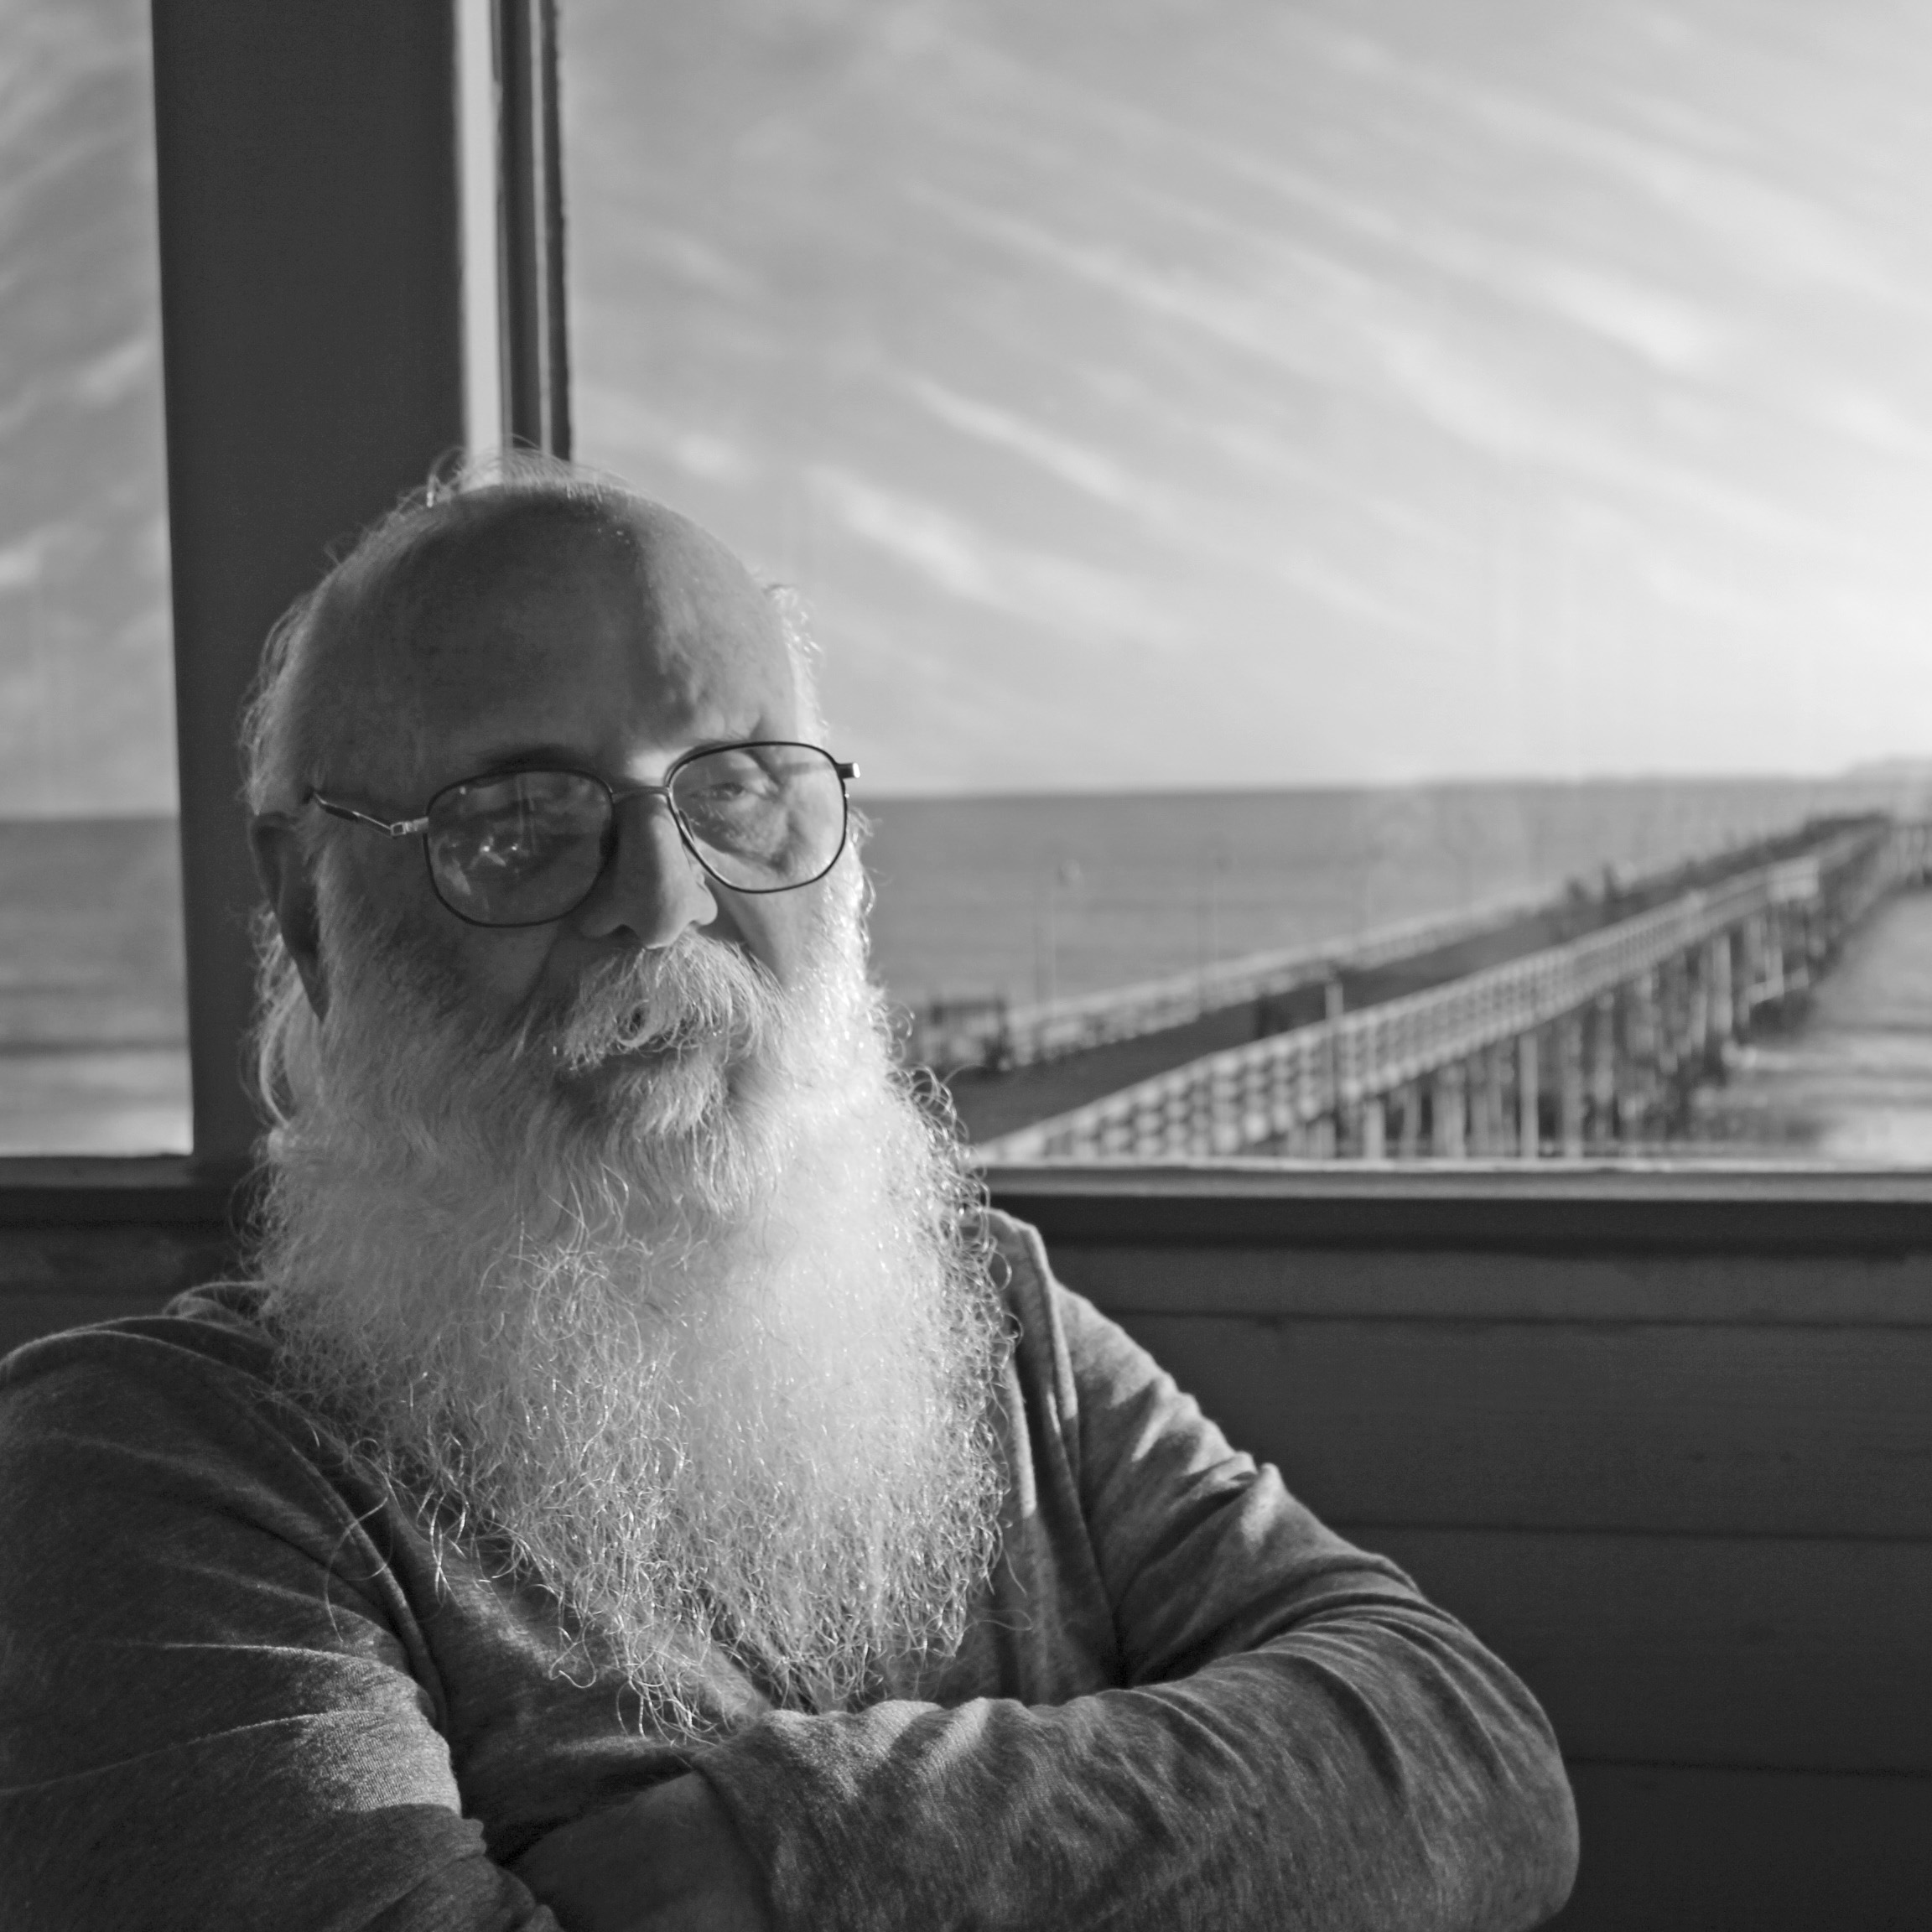 Ralph Mahan hanging out at the Ventura Pier.